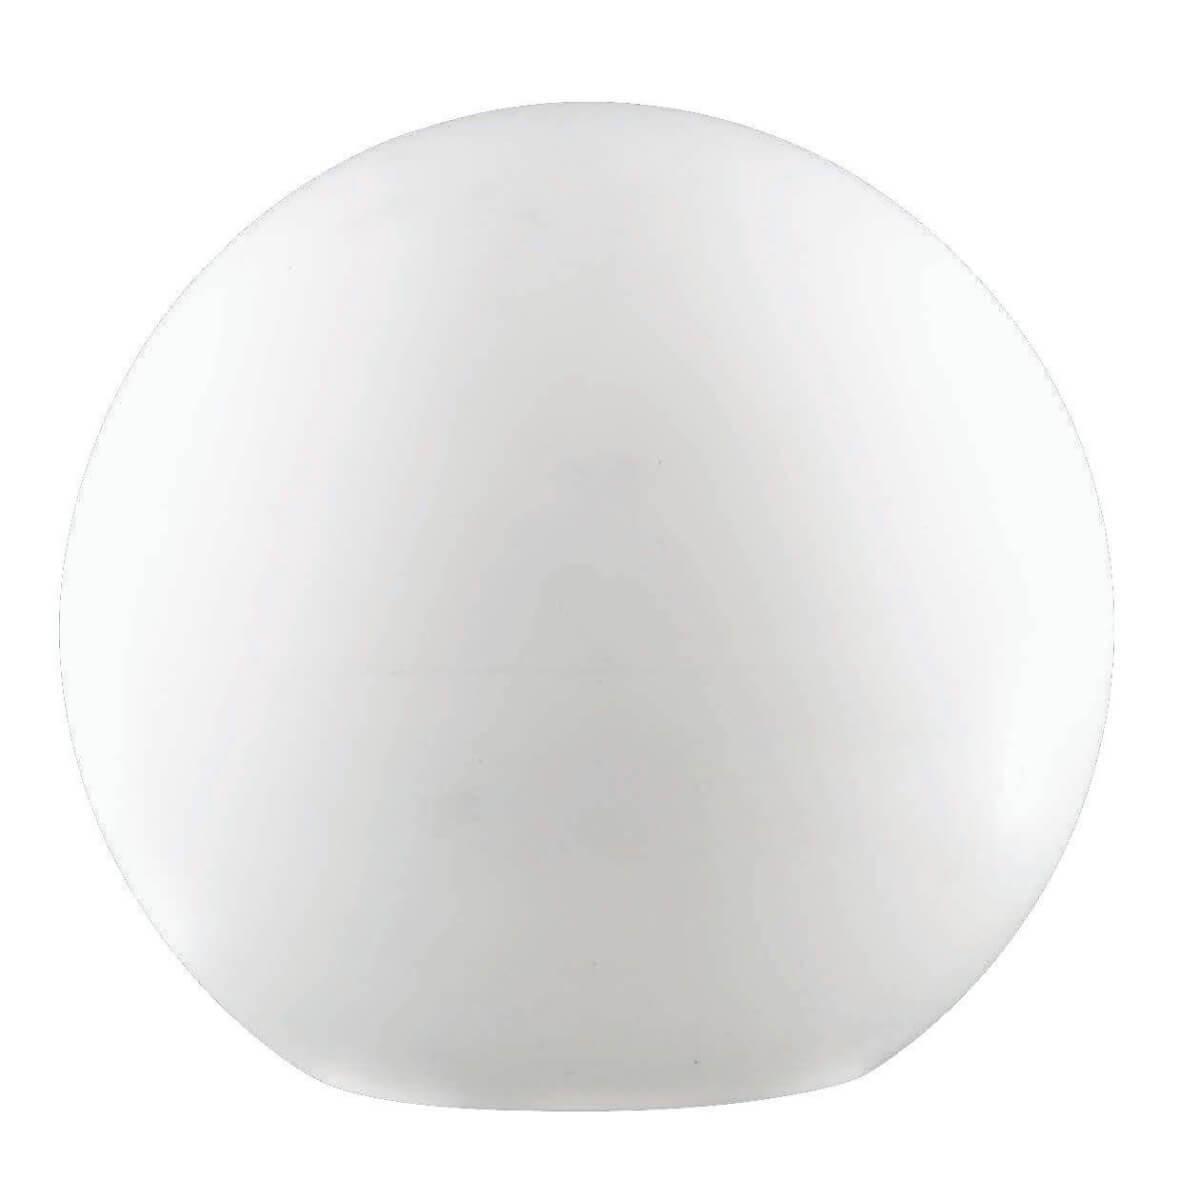 Светильник Ideal Lux Sole Pt1 Small Sole недорого